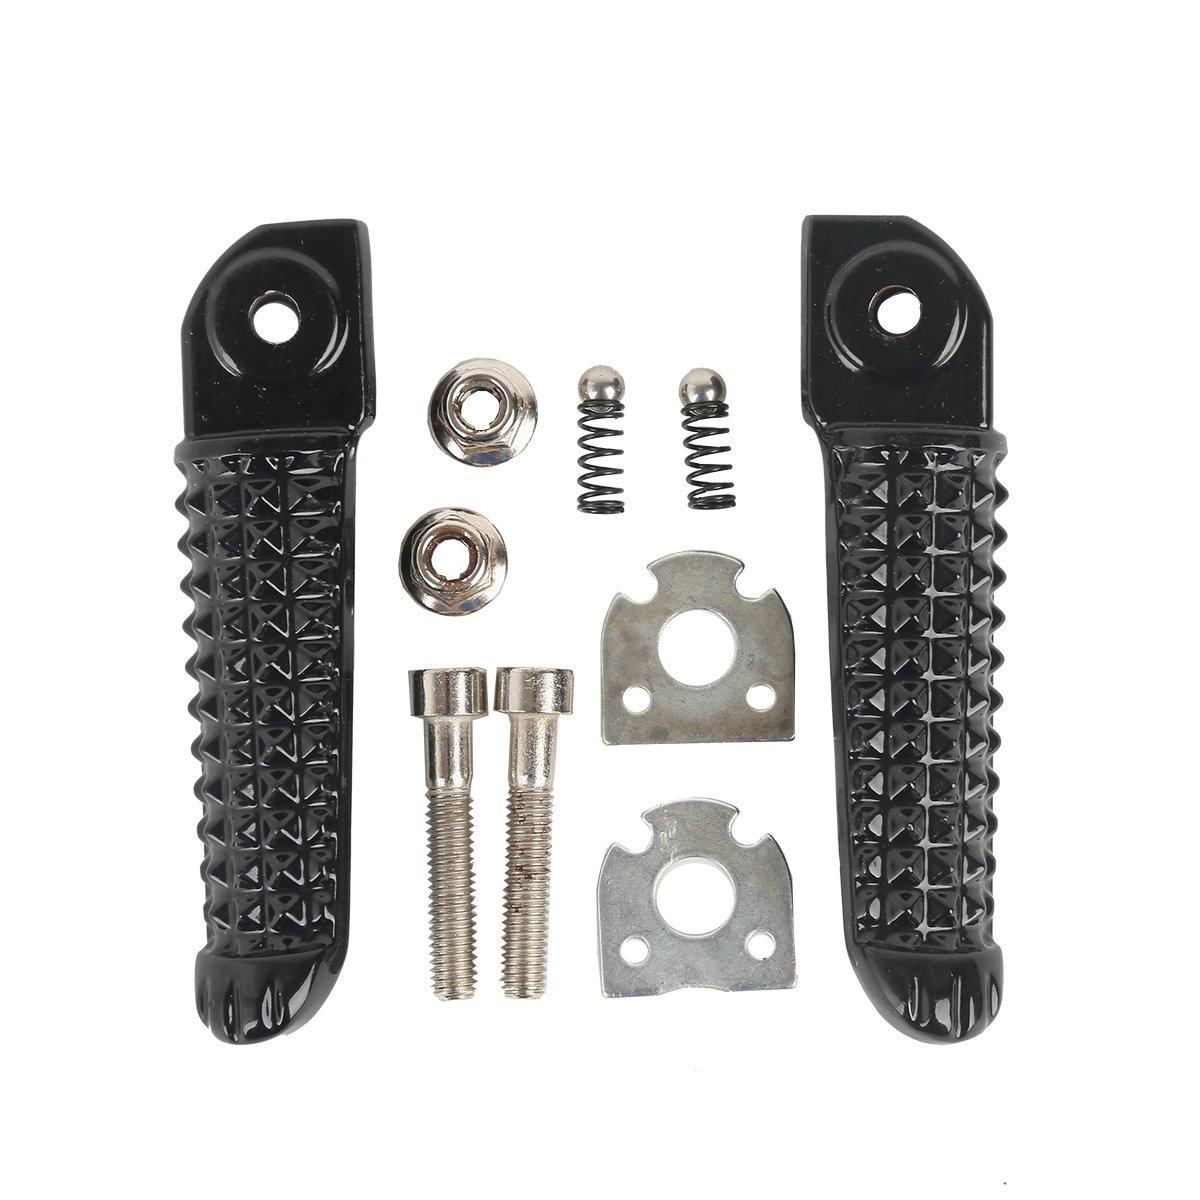 JFGRACING Moto Anteriori pedane poggiapiedi Pedali per Yamaha TDR125R FZ6/Fazer FZR600/SP XJ600/N S Diversion YZF 600/R6